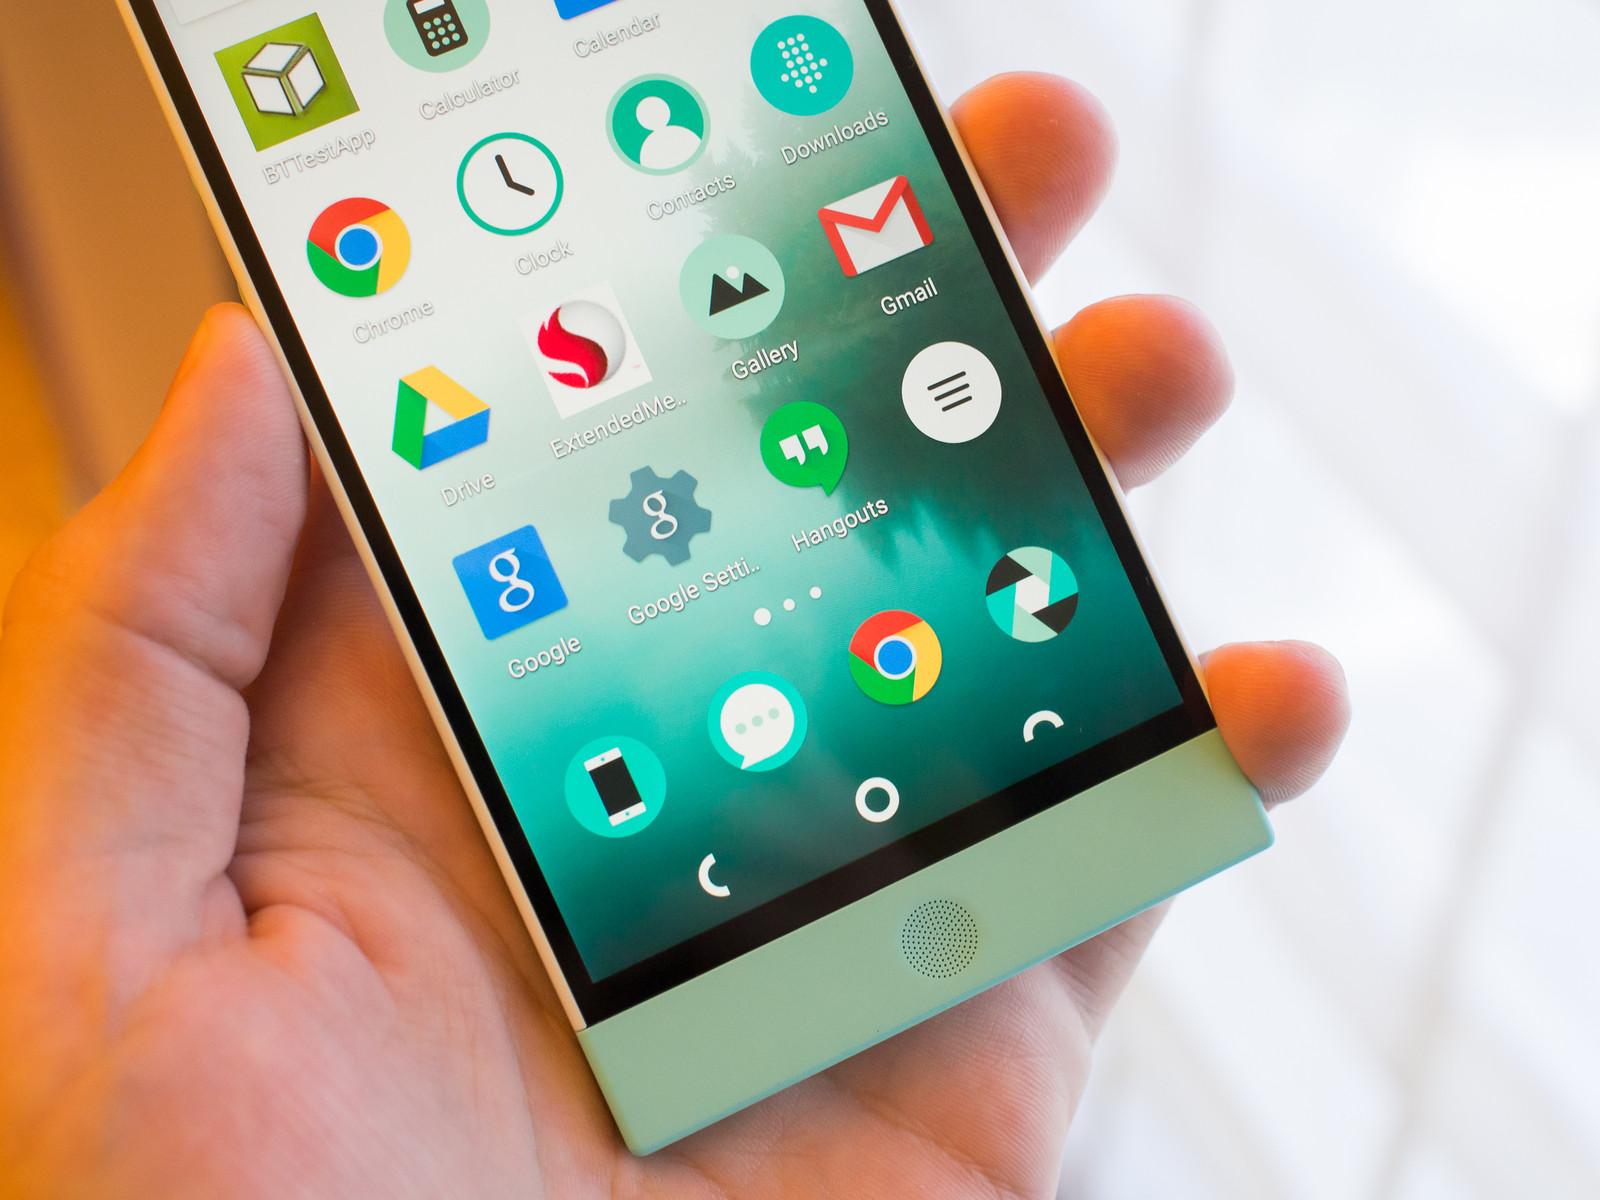 Telefonul axat pe cloud Nexbit Robin strânge 1 milion de dolari pe Kickstarter, va sosi prin operatorul Verizon